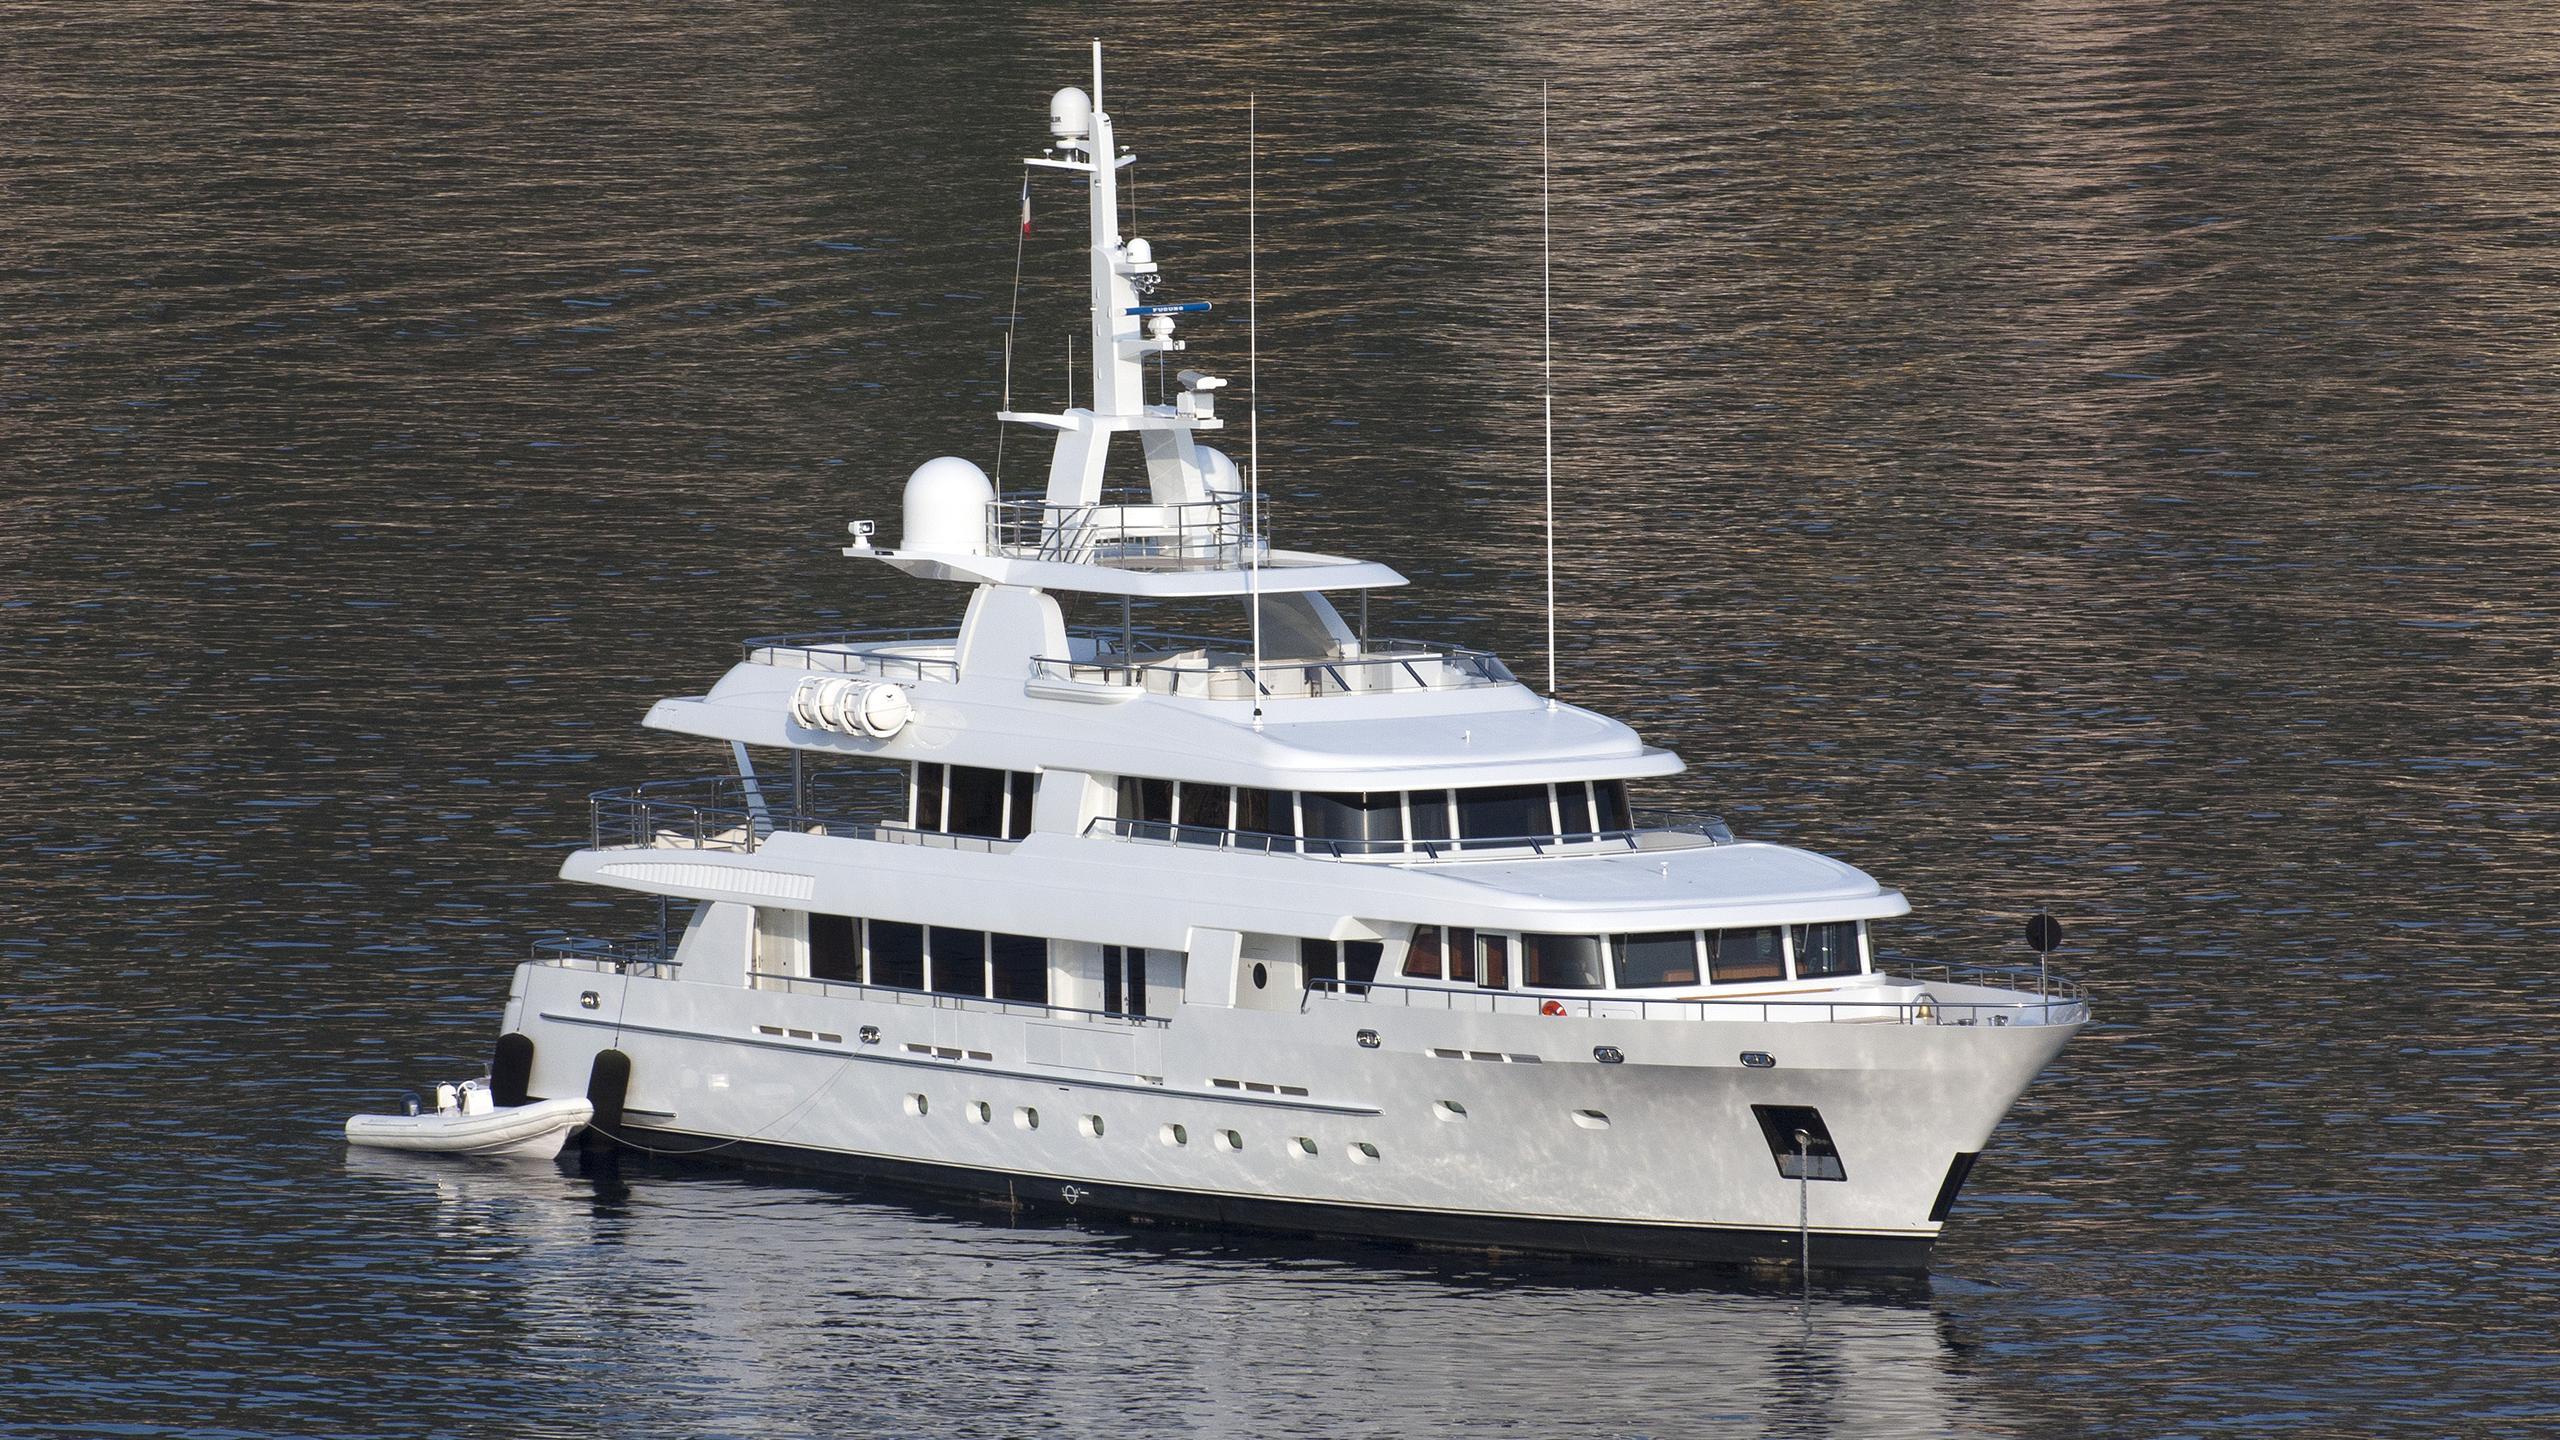 arete-motoryacht-bloemsma-van-breemen-2014-44m-aerial